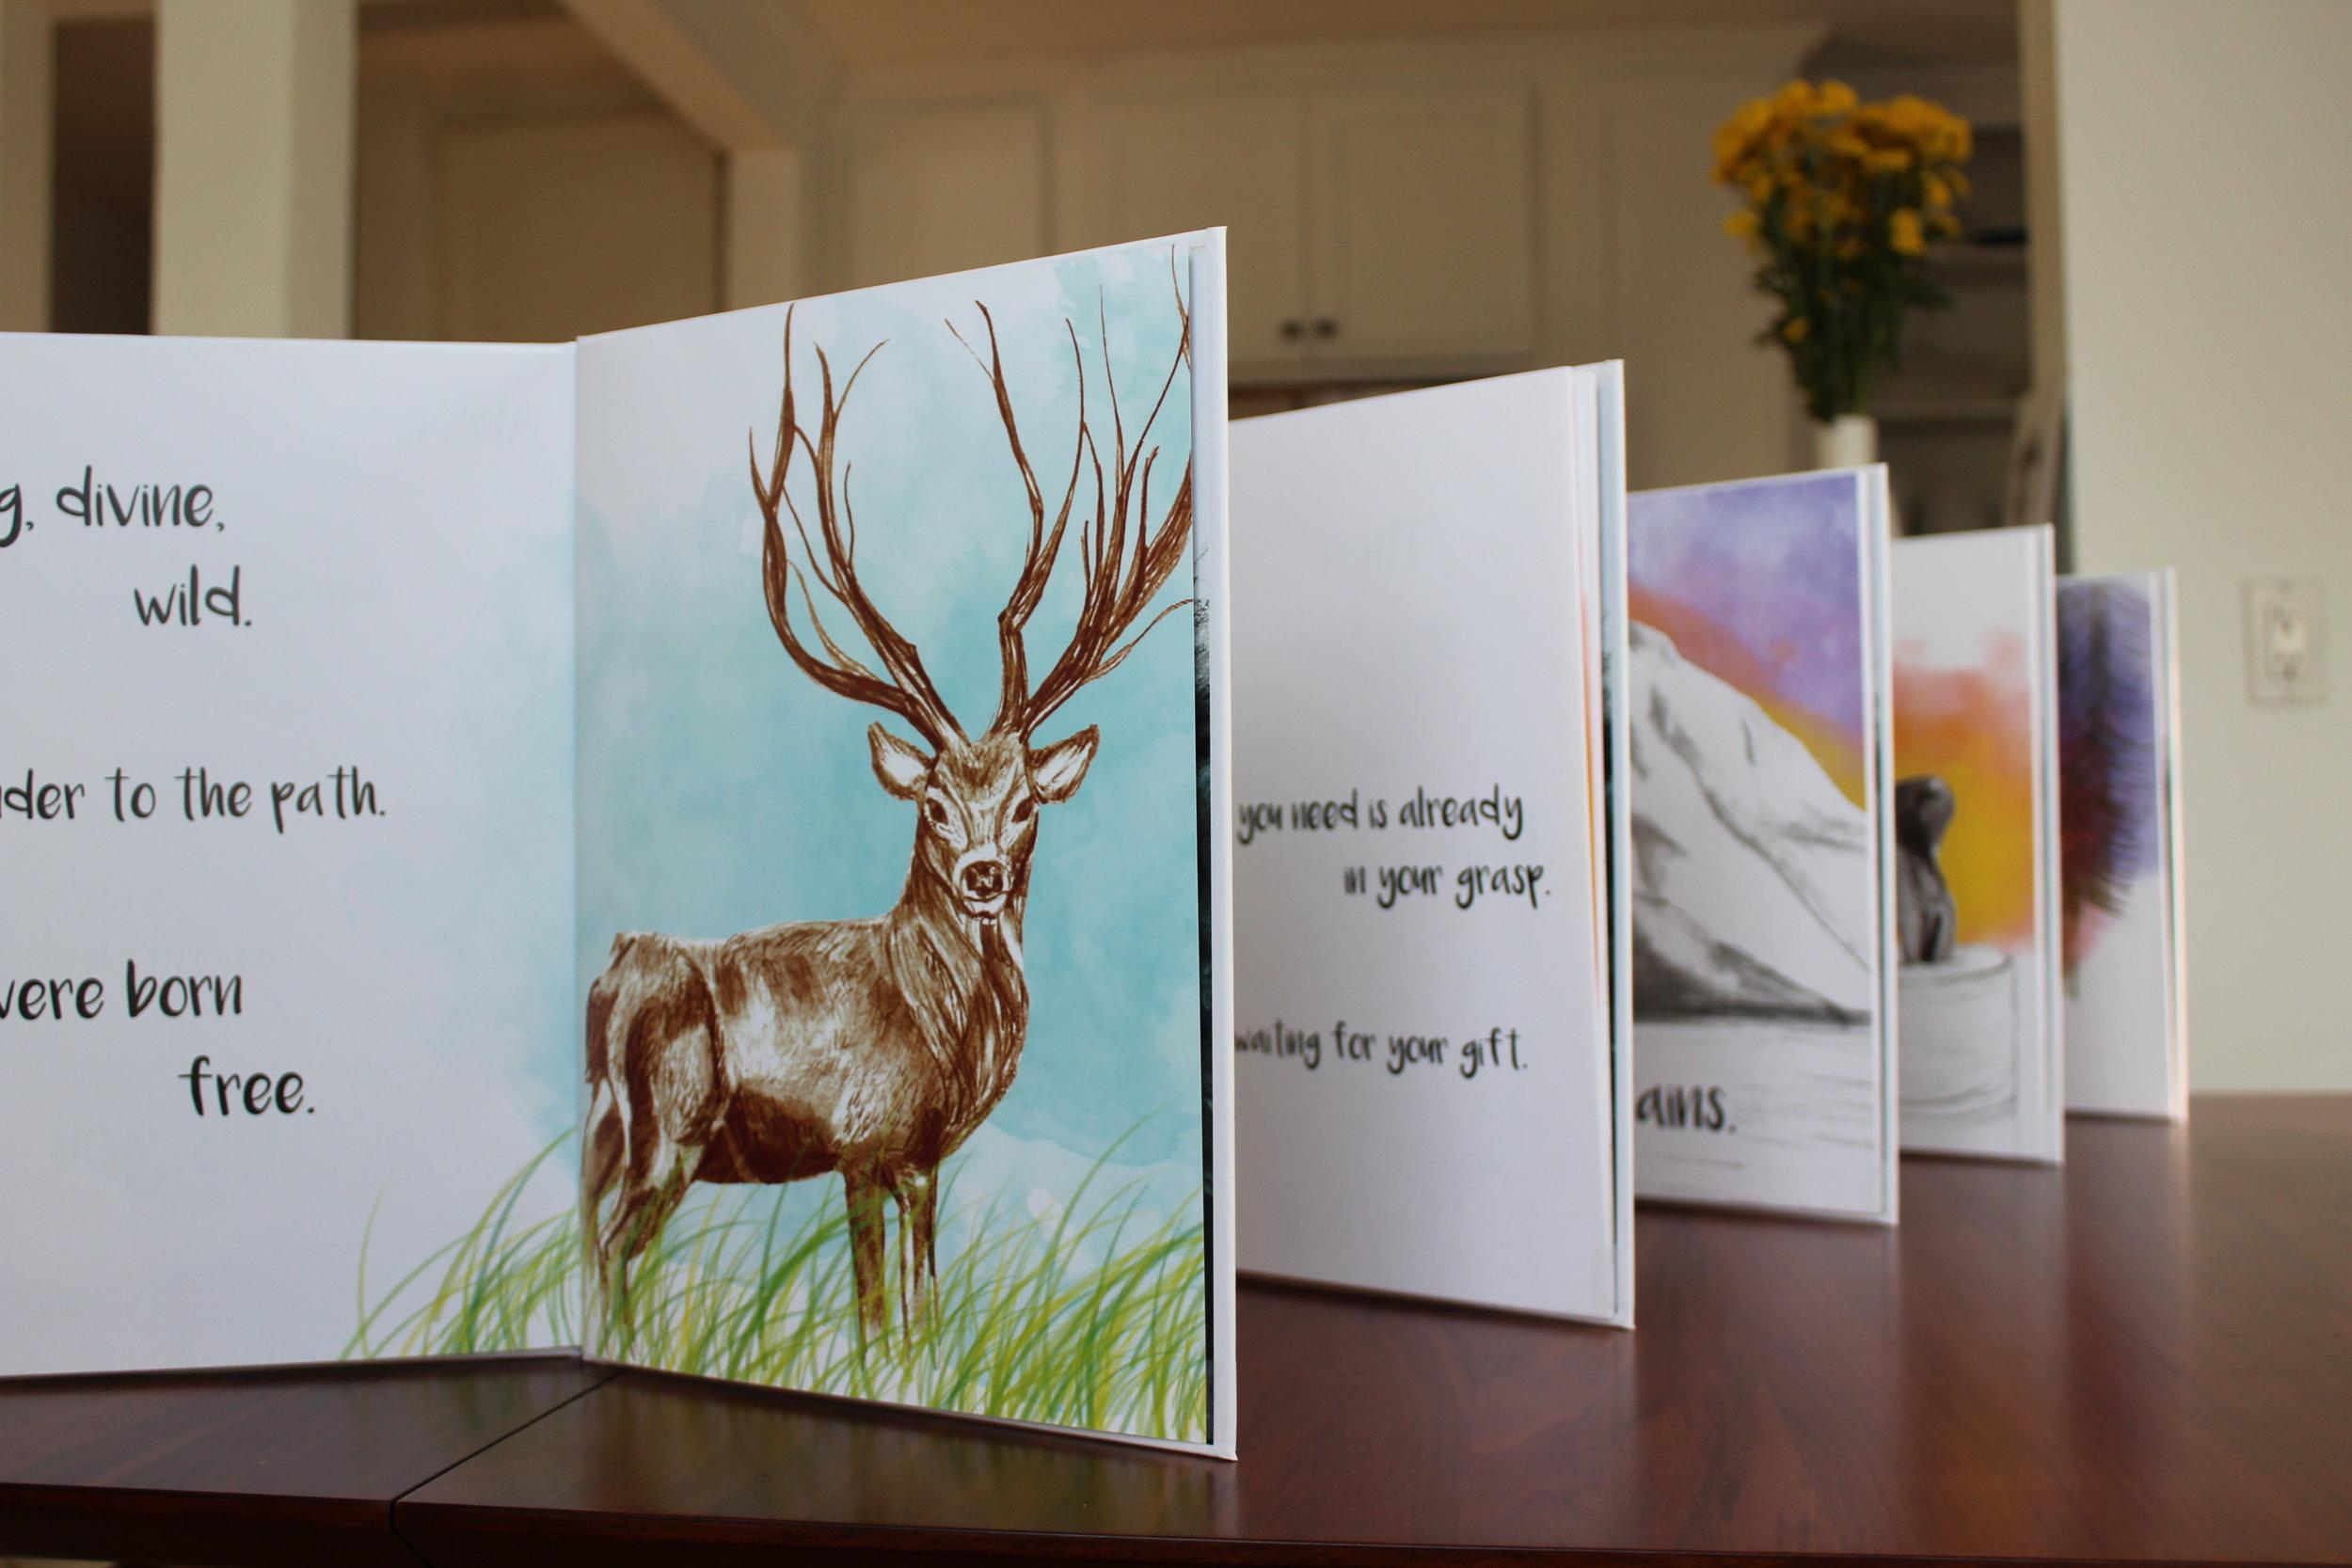 mountains-deer-amazing-flowers-unknown-a-book-about-mindfulness-stephen-wawryk-luna-maha-meditation-amazon-books